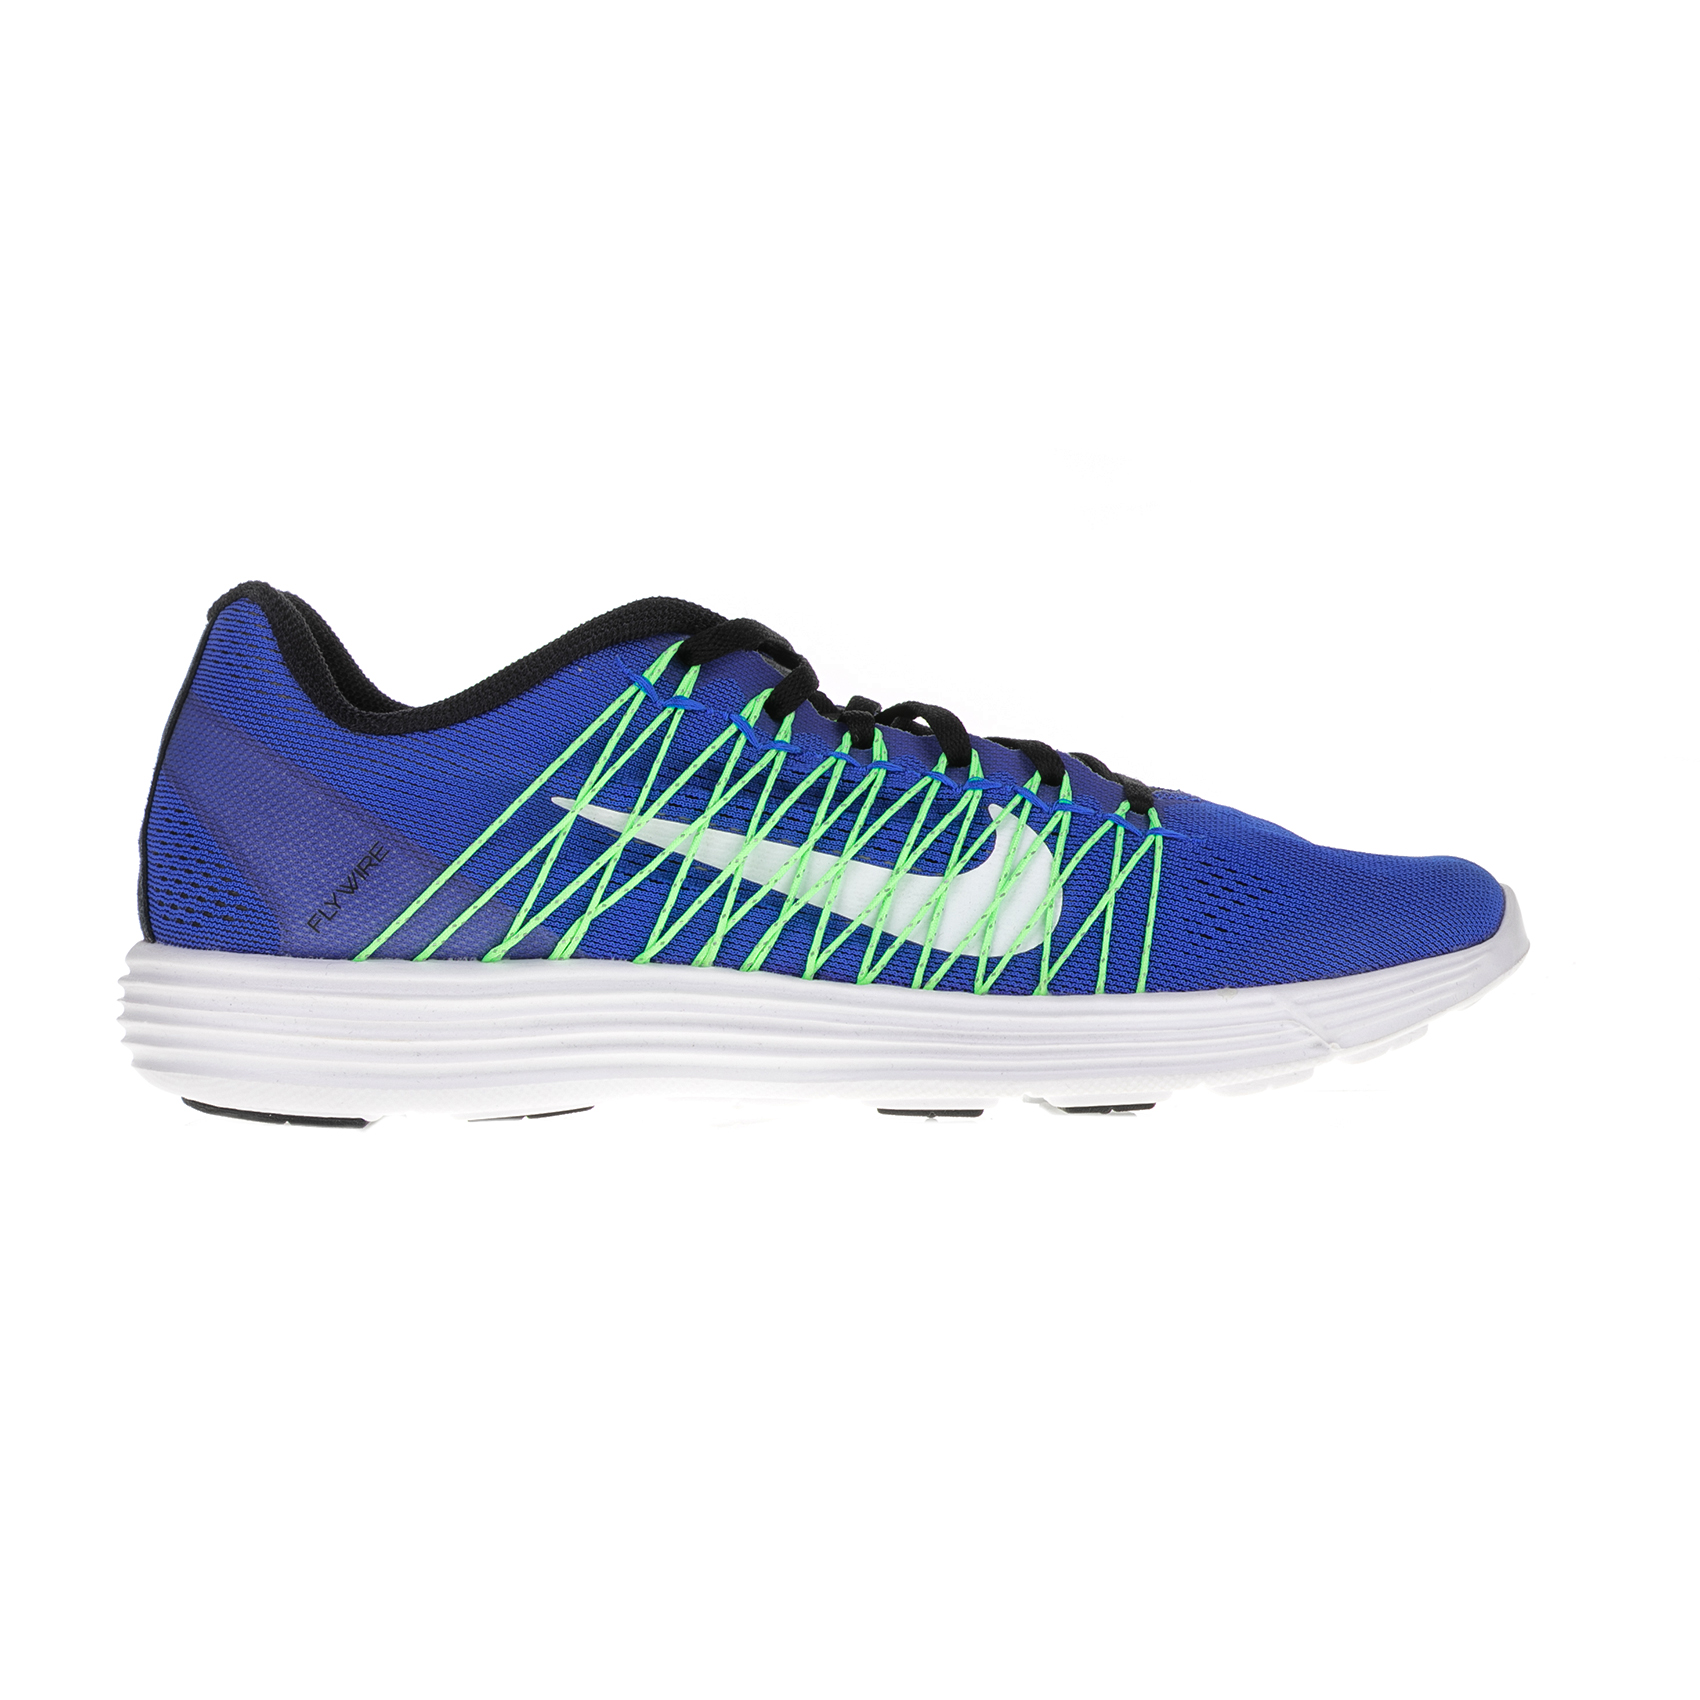 NIKE – Ανδρικά αθλητικά παπούτσια Nike LUNARACER+ 3 μπλε – πράσινα